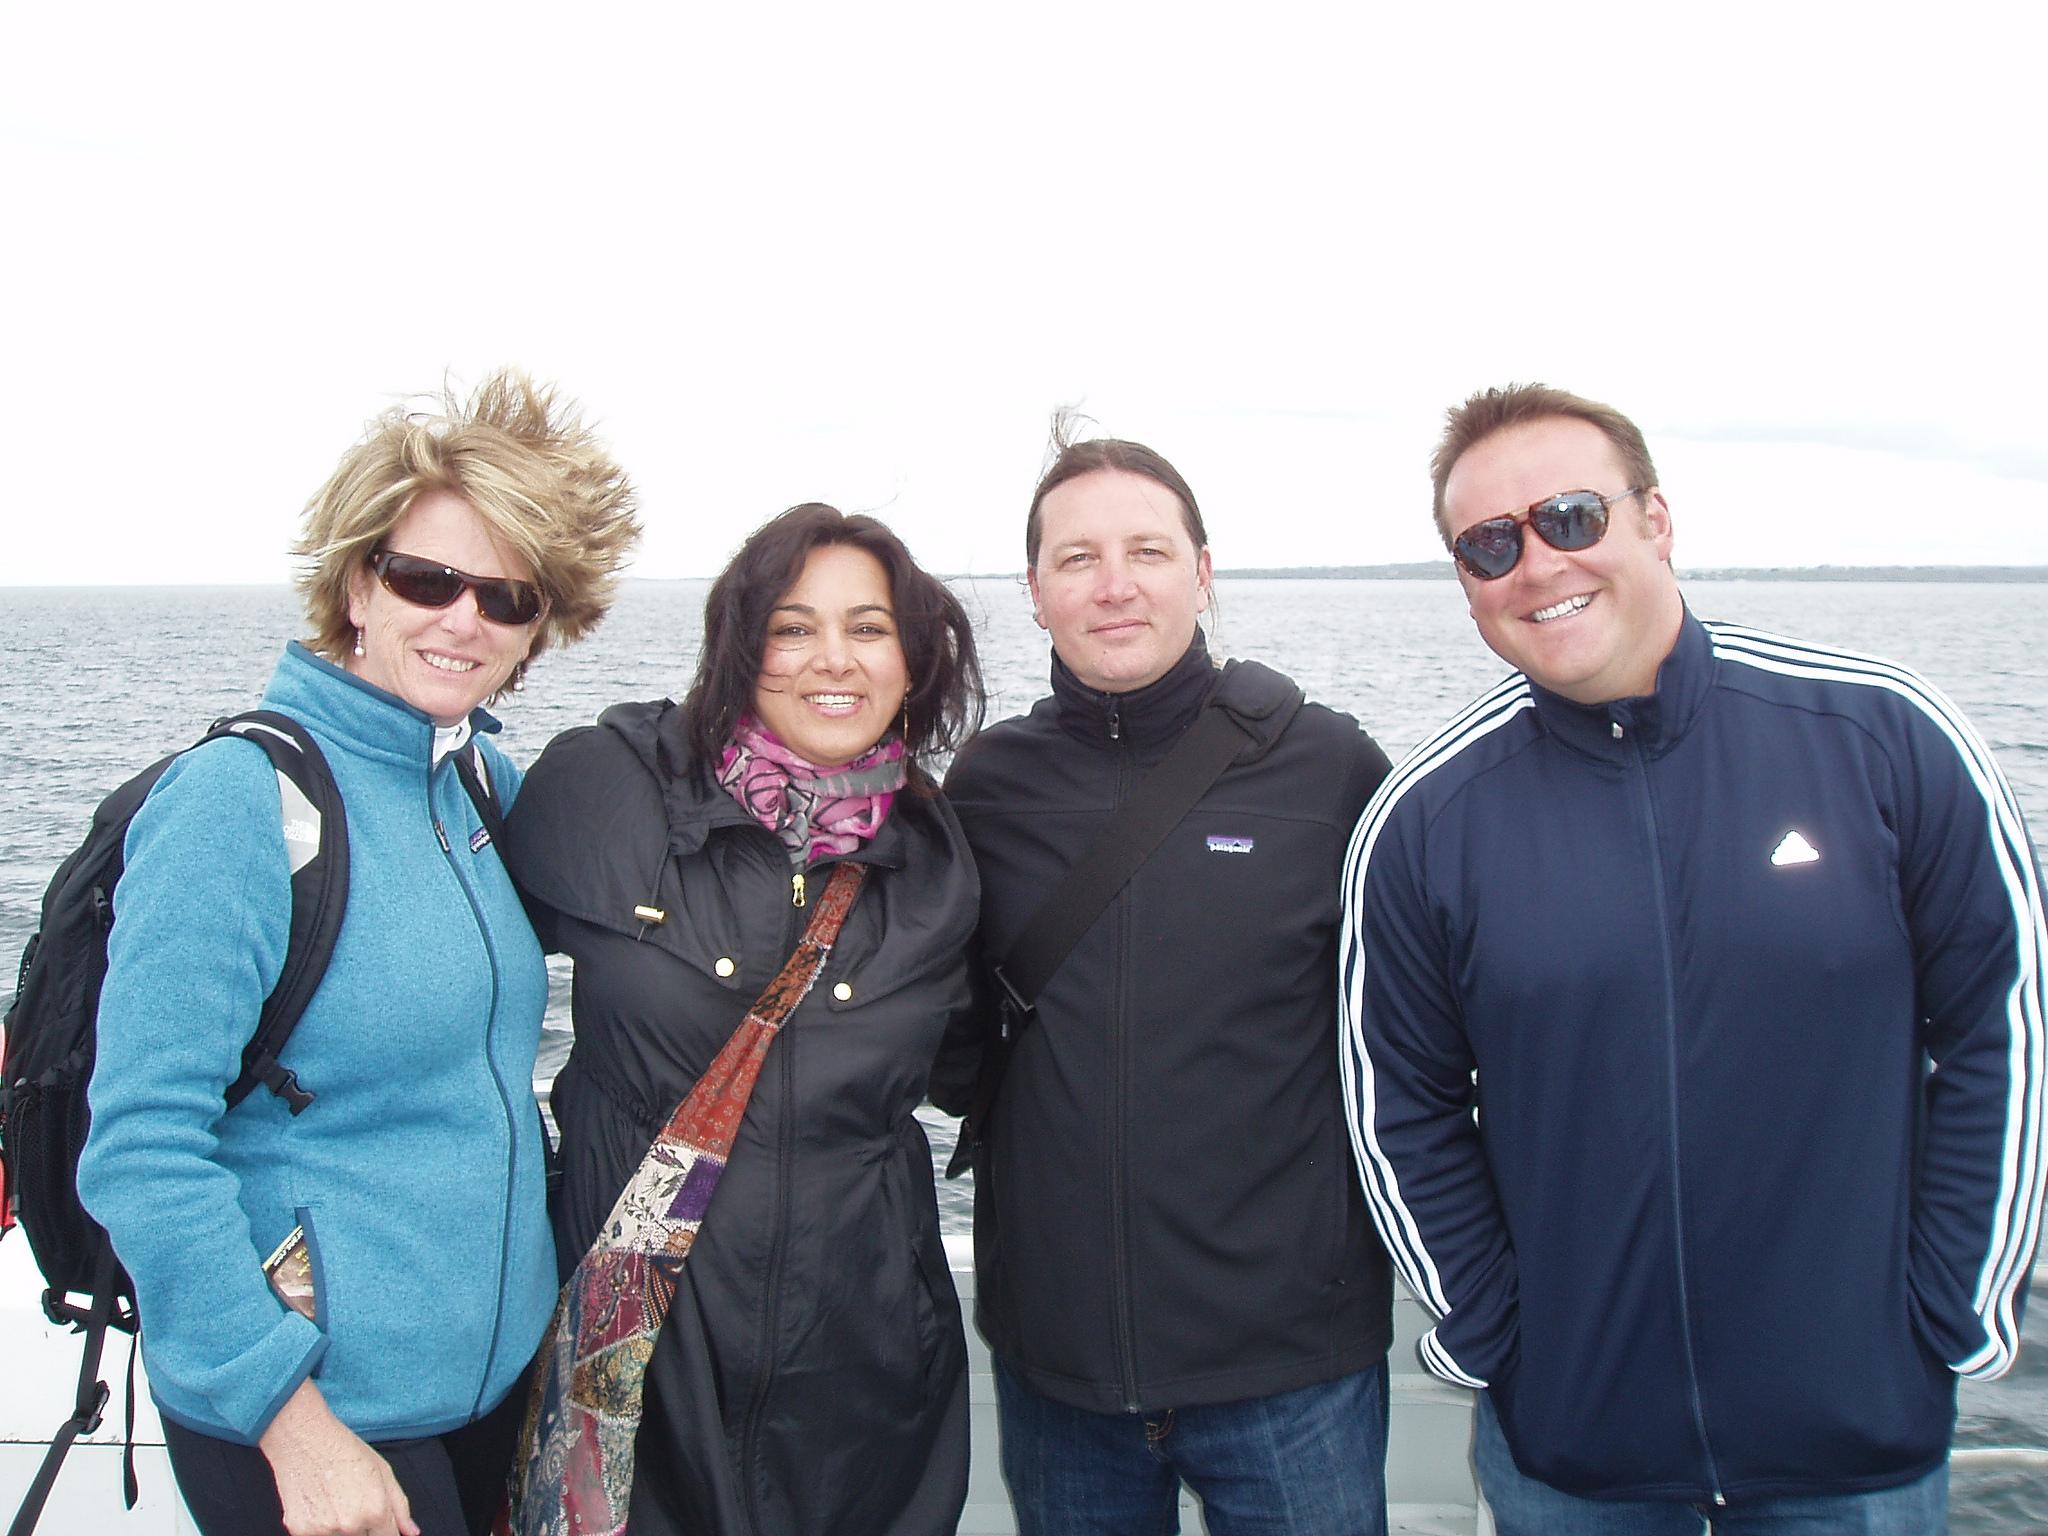 Group on Aran Islands Ireland